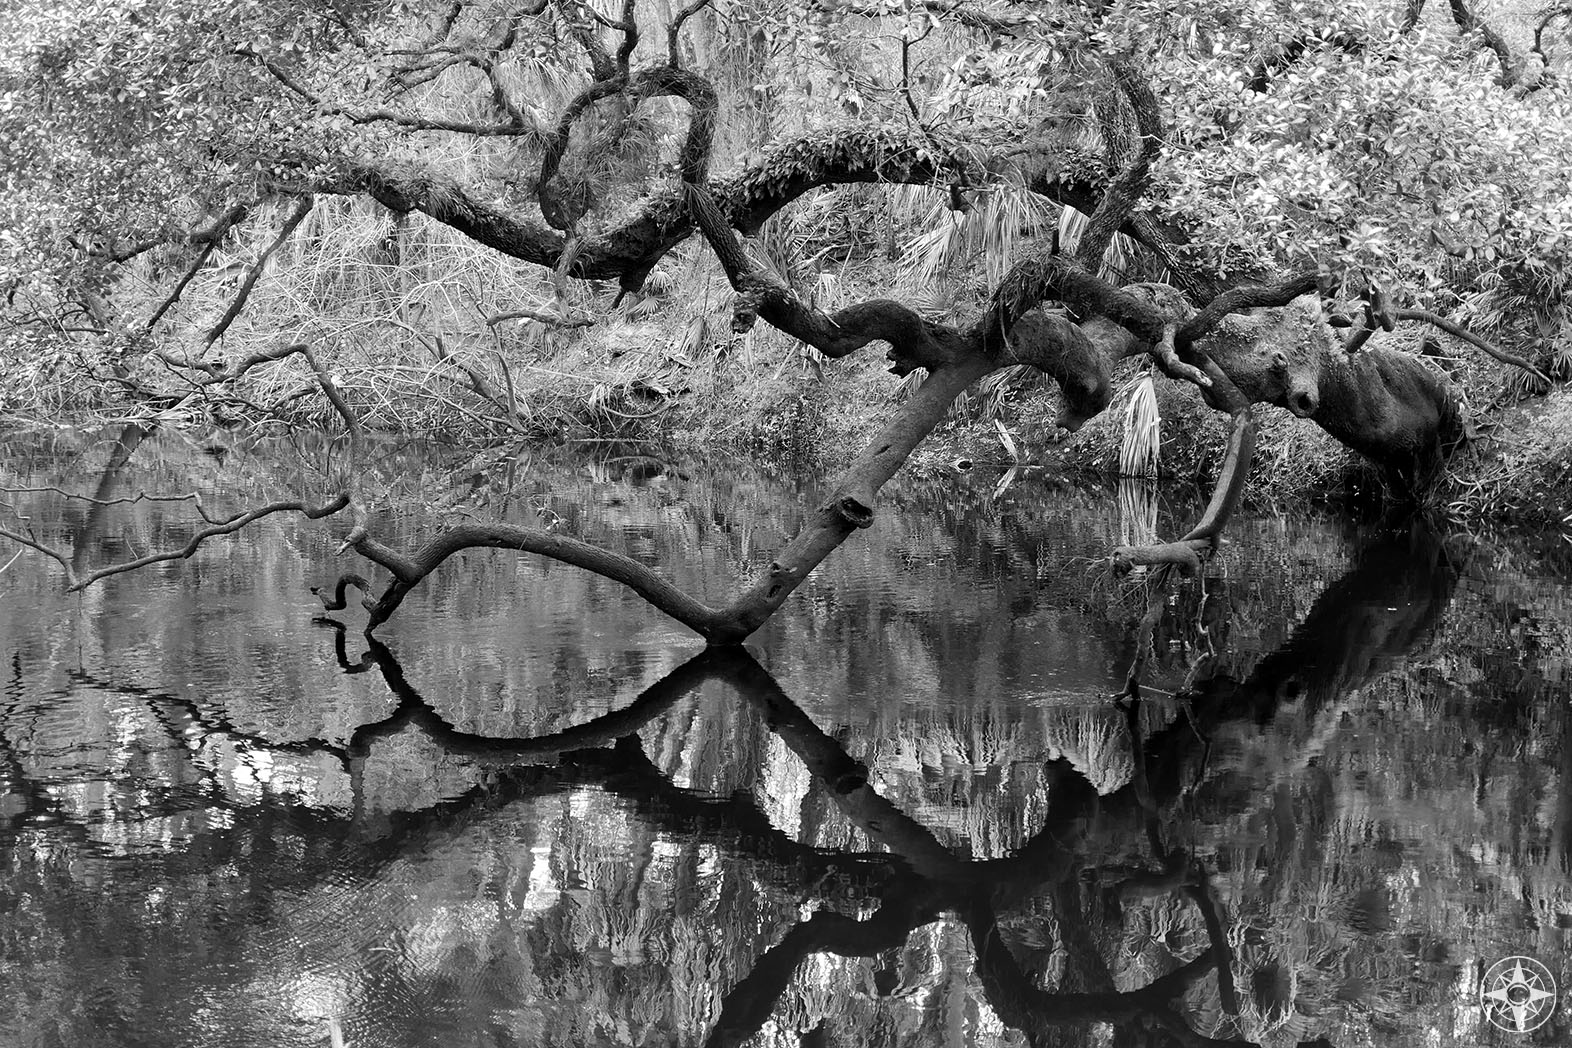 Tree branch reflection, black and white, Hillsborough River